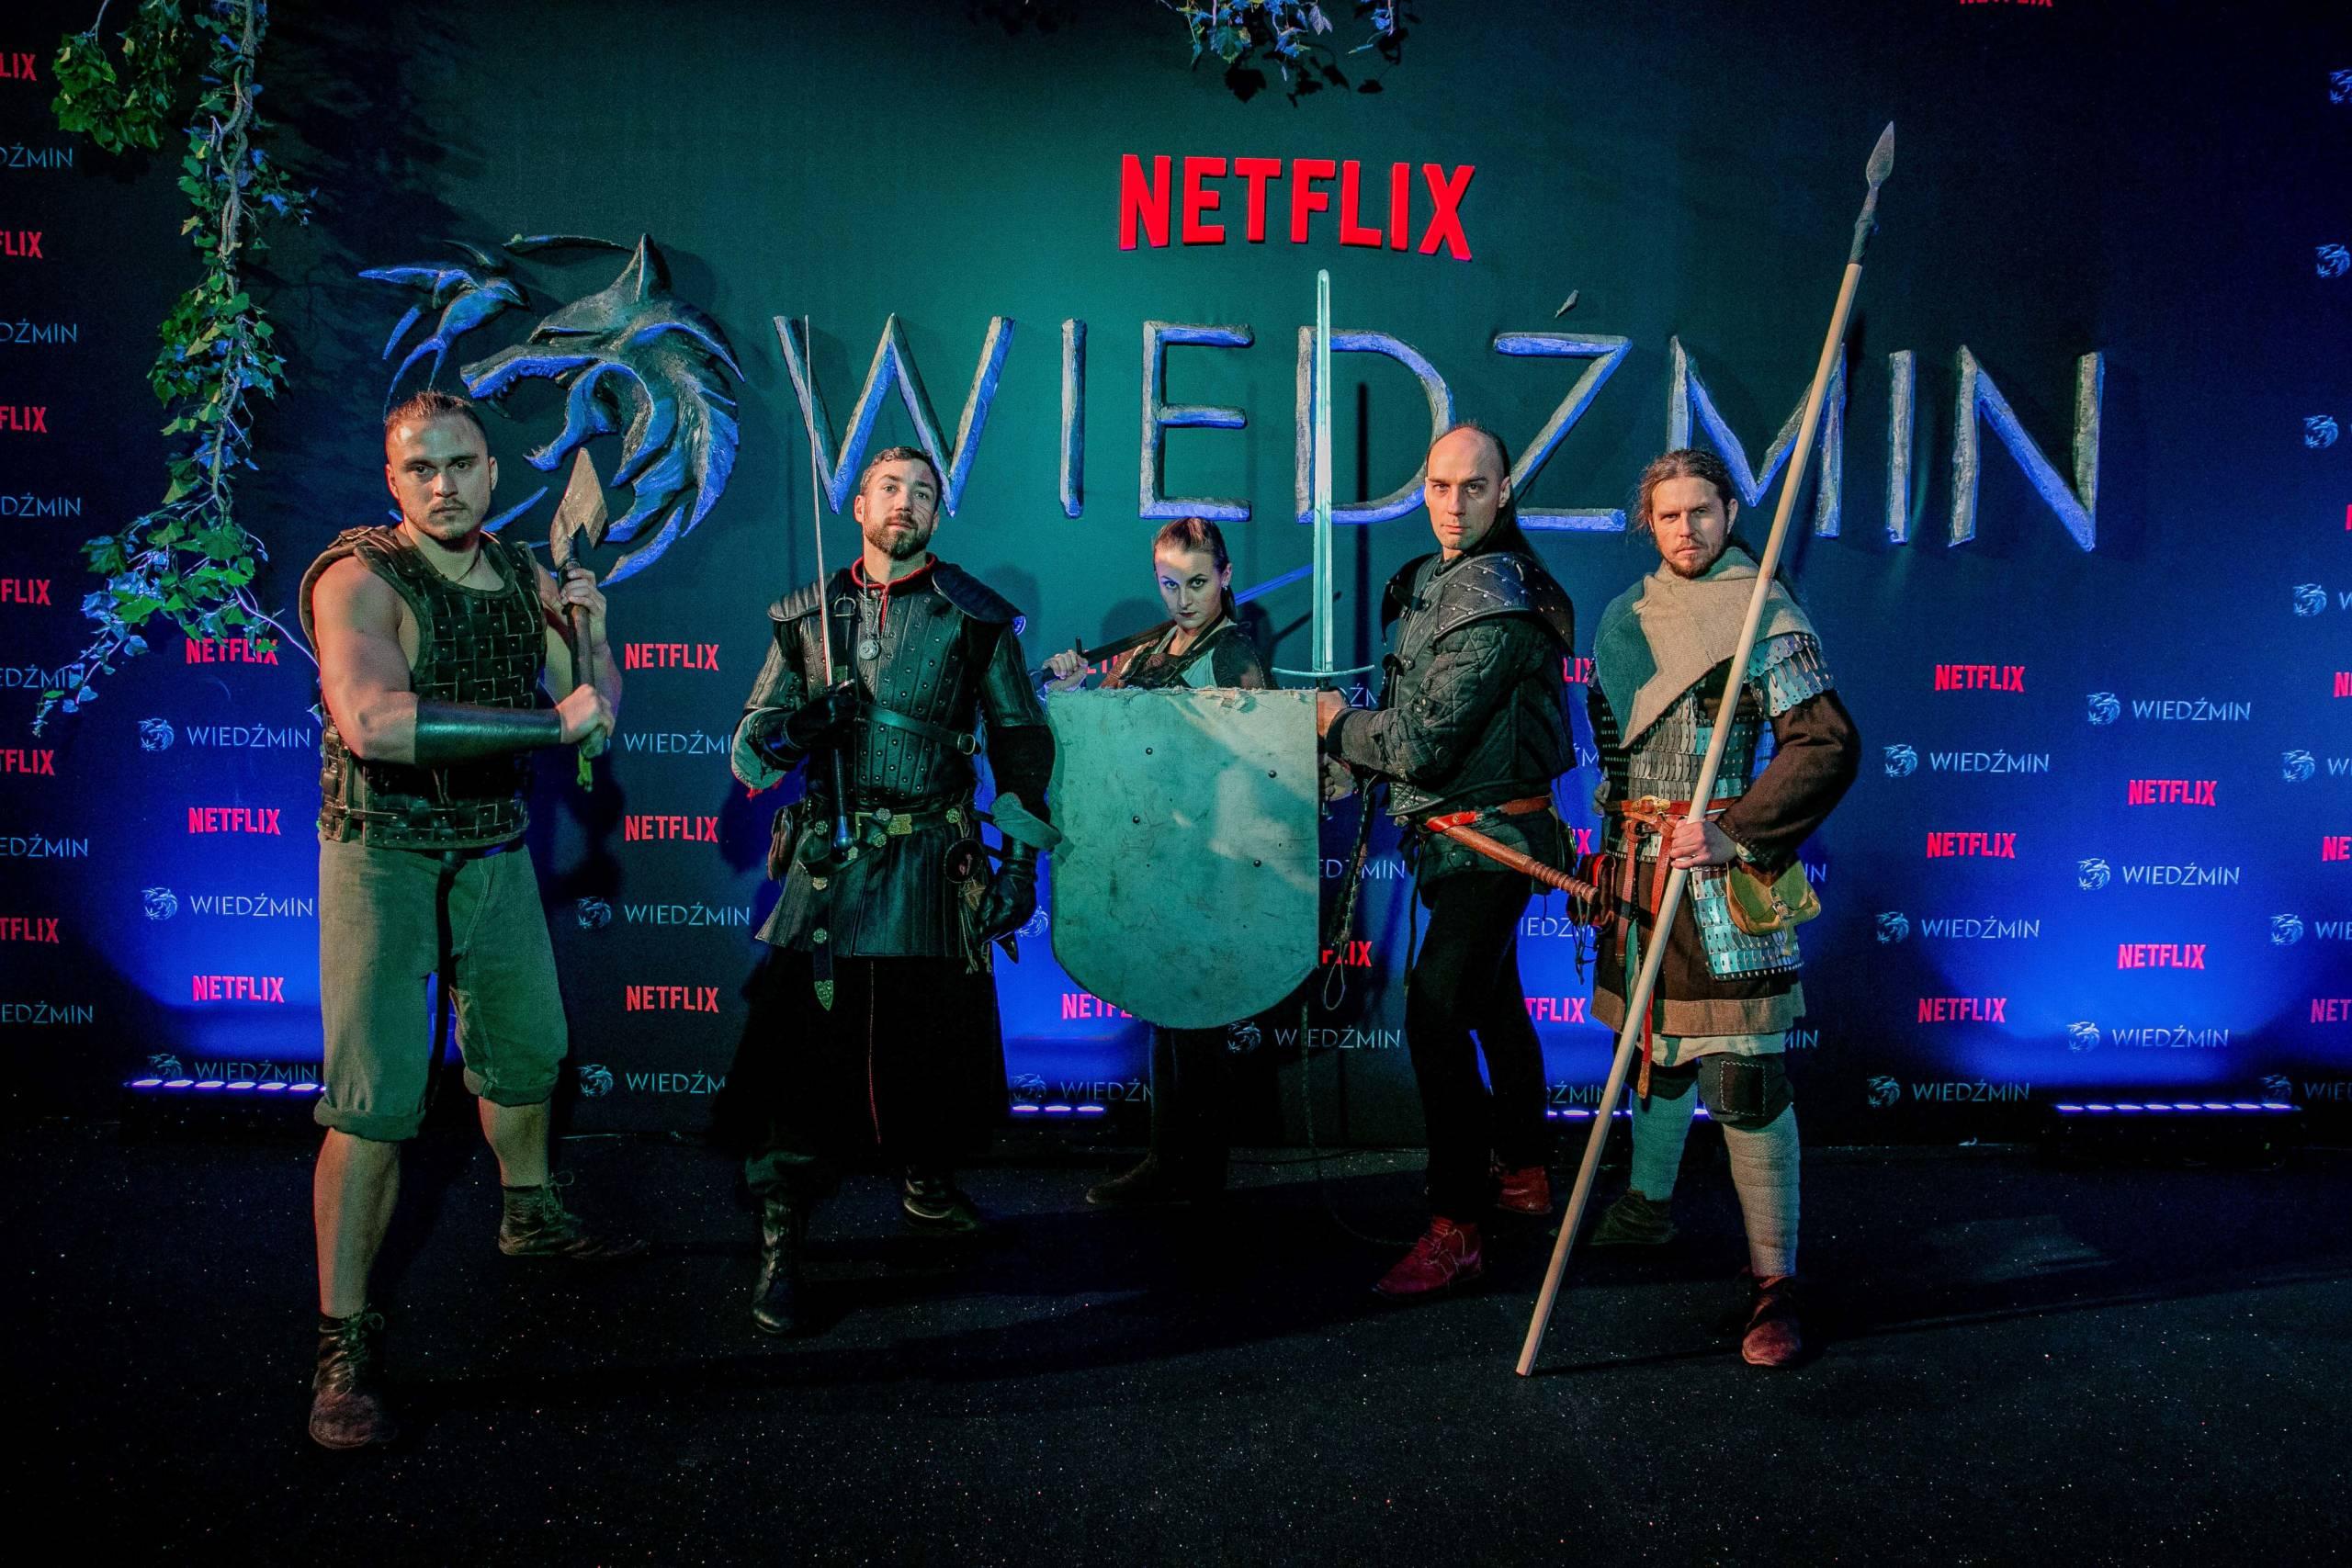 The Witcher Warsaw 18 12 2019 Marcin Oliva Soto 1318